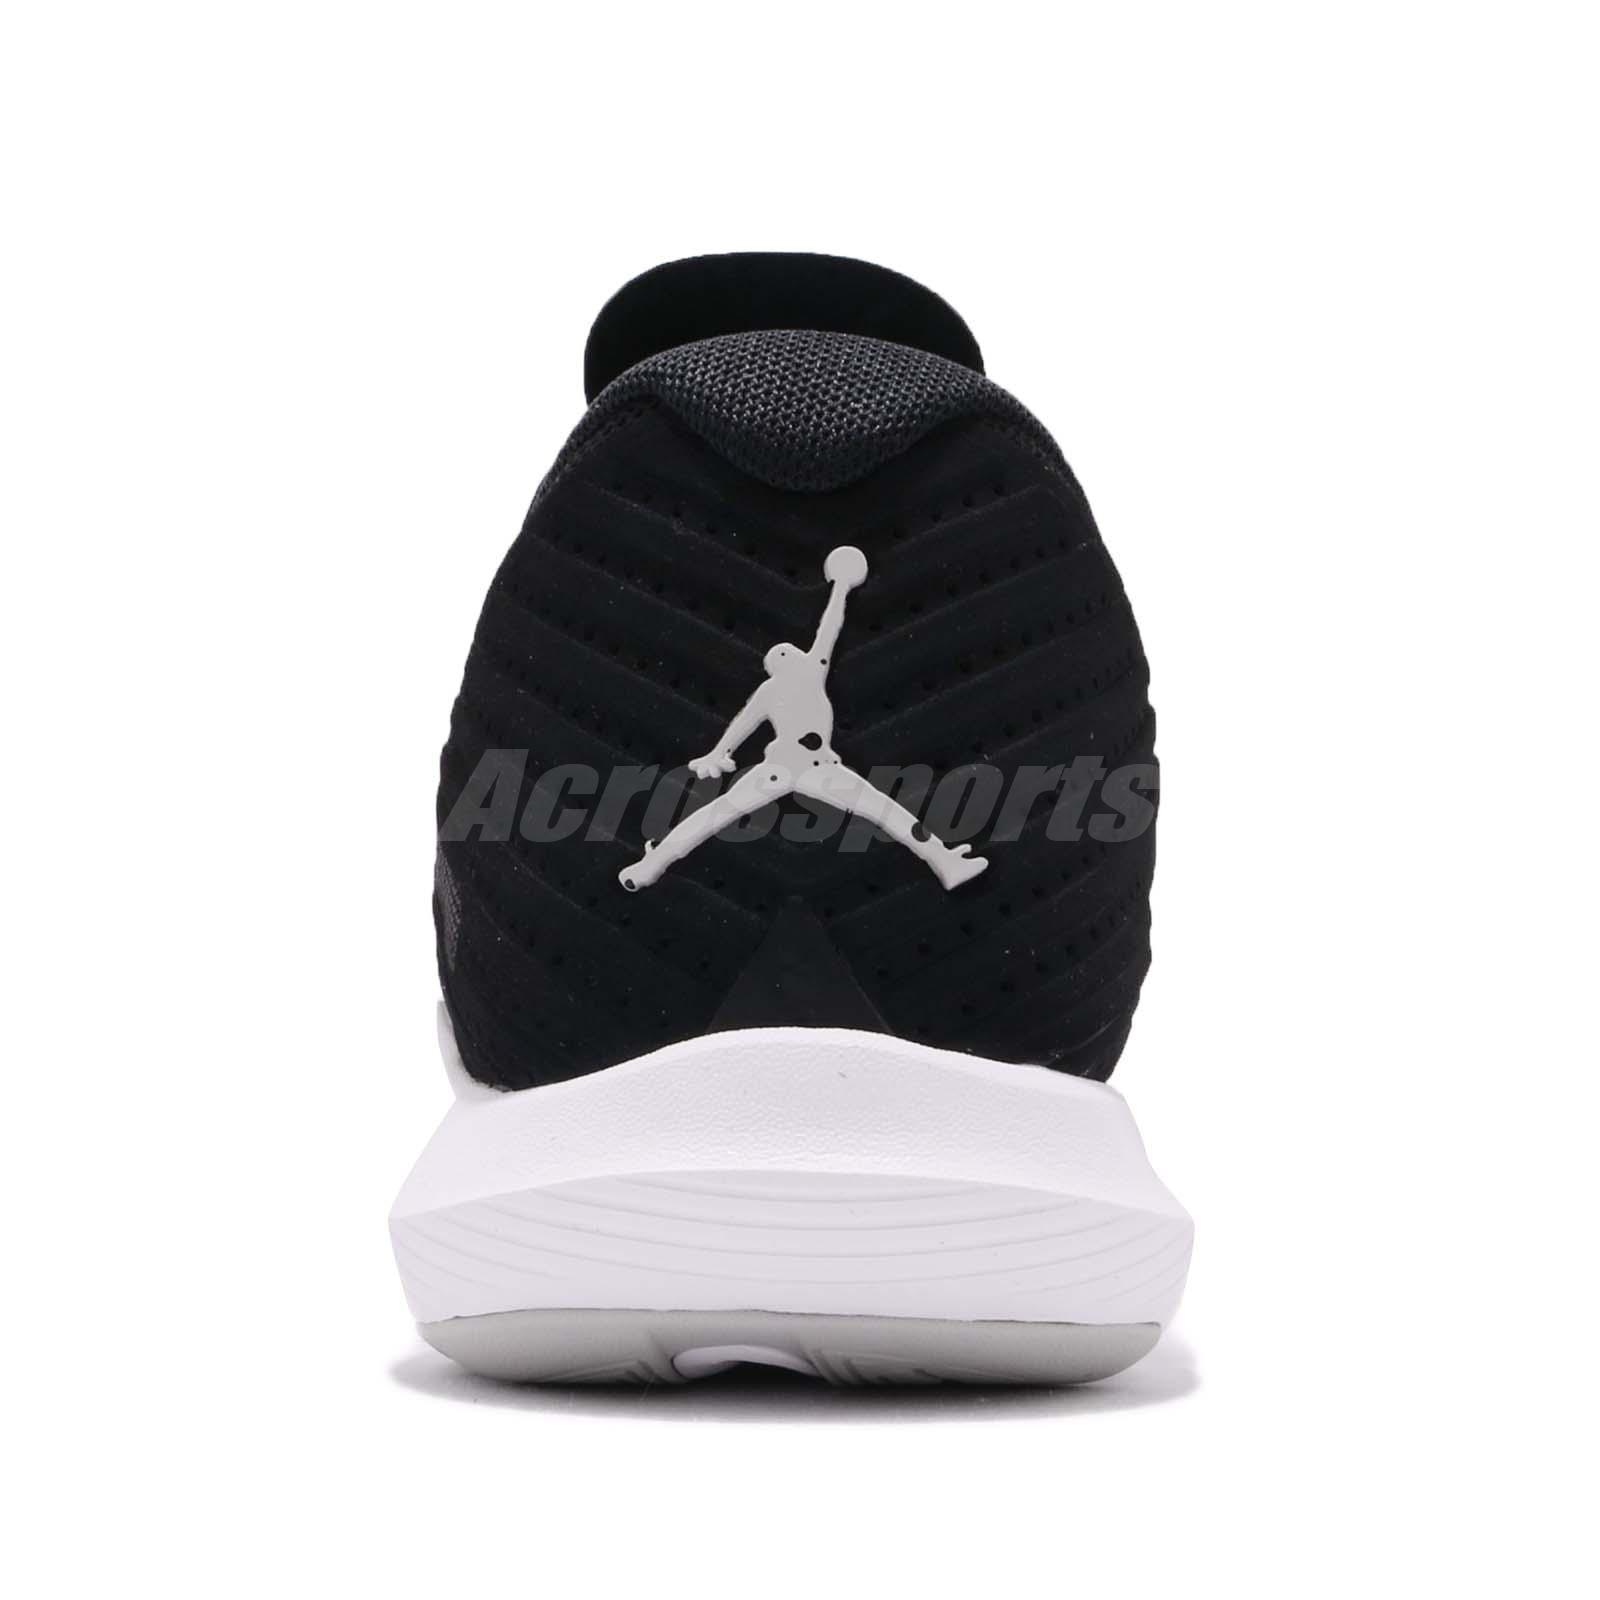 3074d0782f60 Nike Jordan Relentless Black White Tech Grey Men Training Shoes ...